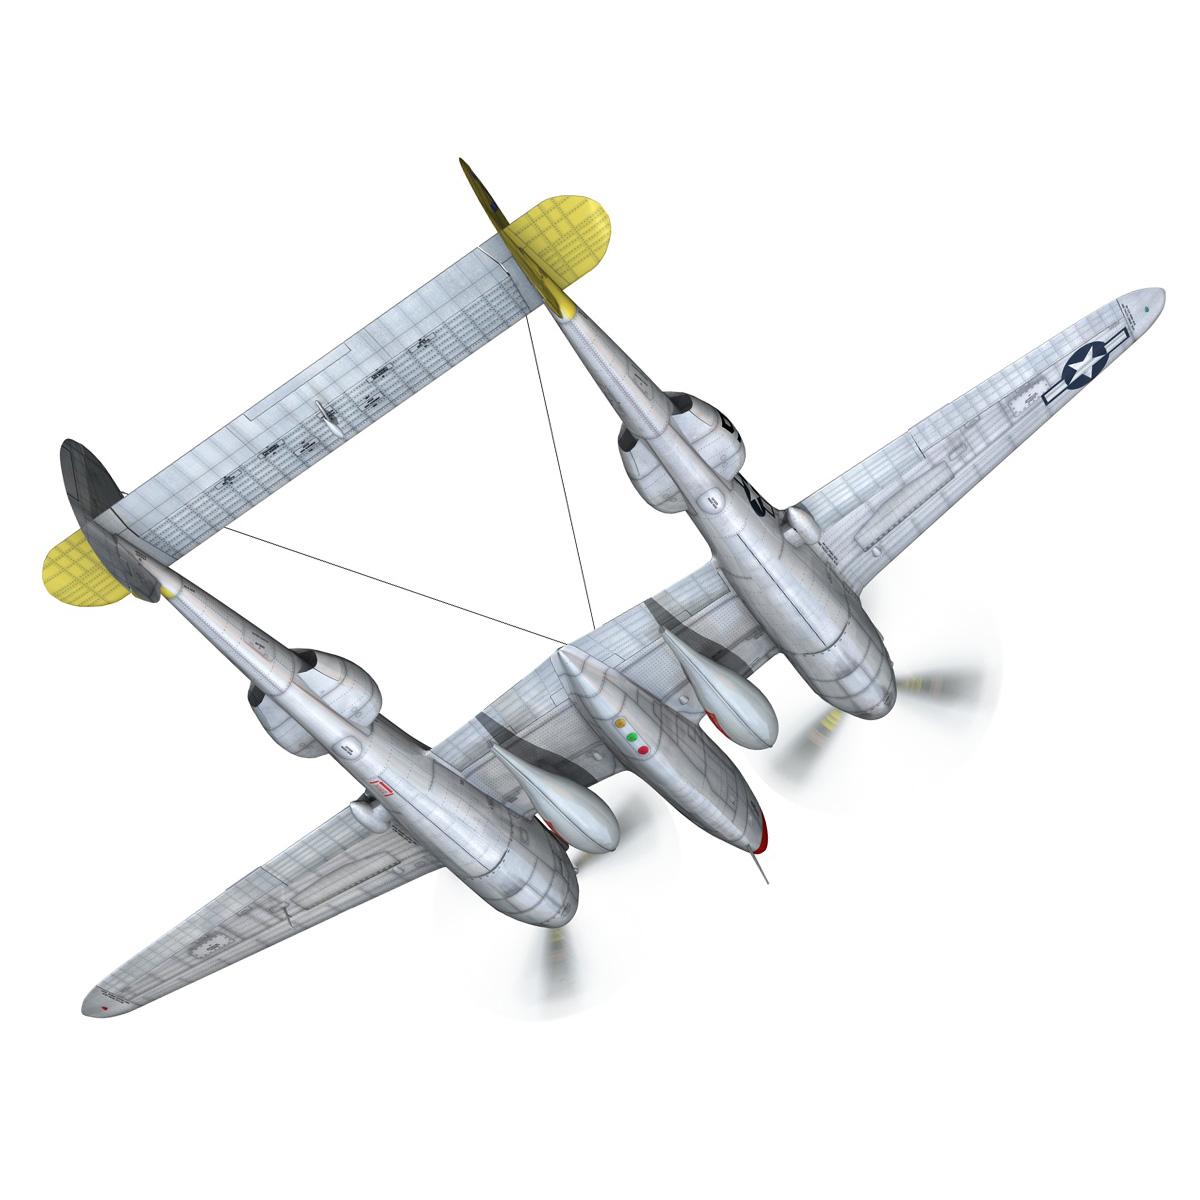 lockheed p-38 lightning – beautiful bitch 3d model fbx c4d lwo obj 272669